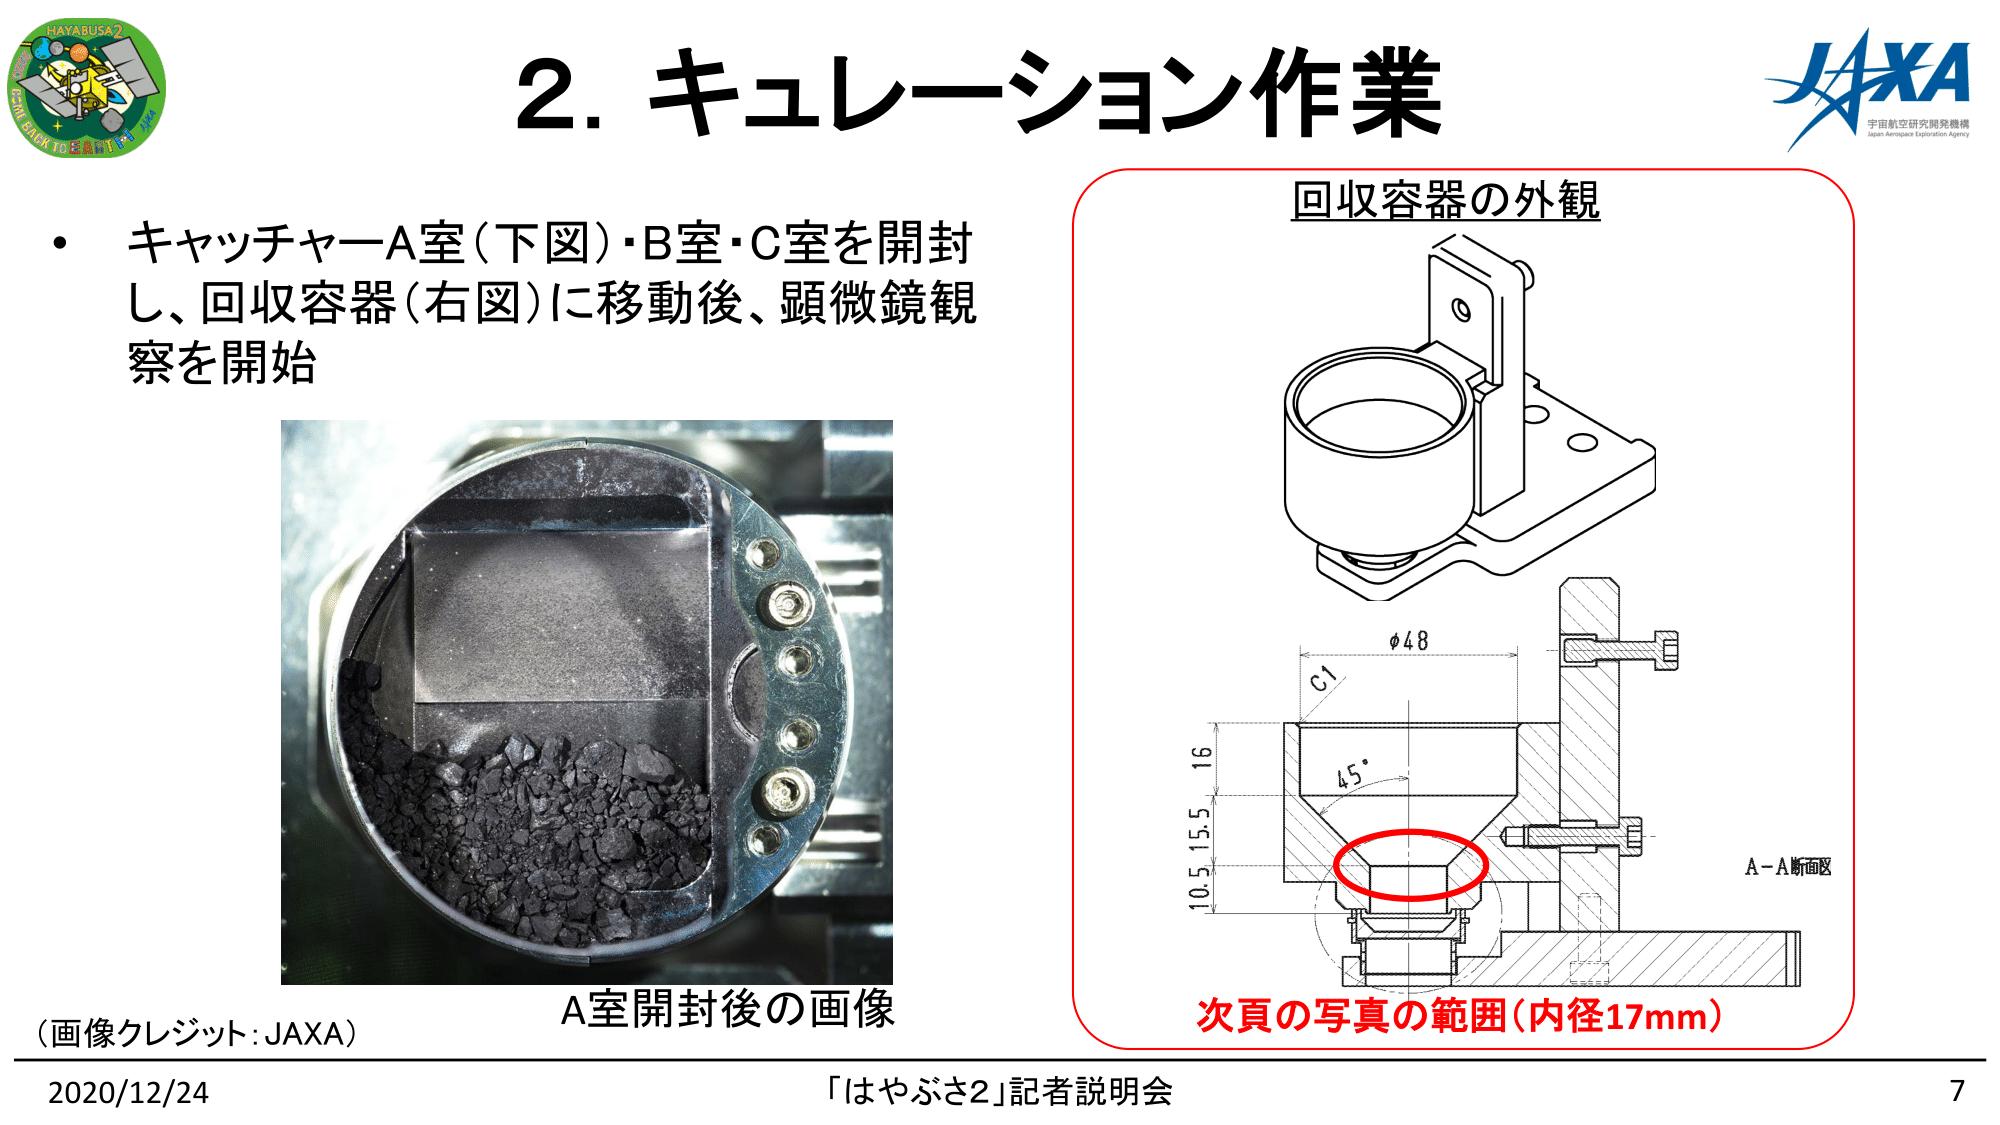 f:id:Imamura:20201224135024p:plain